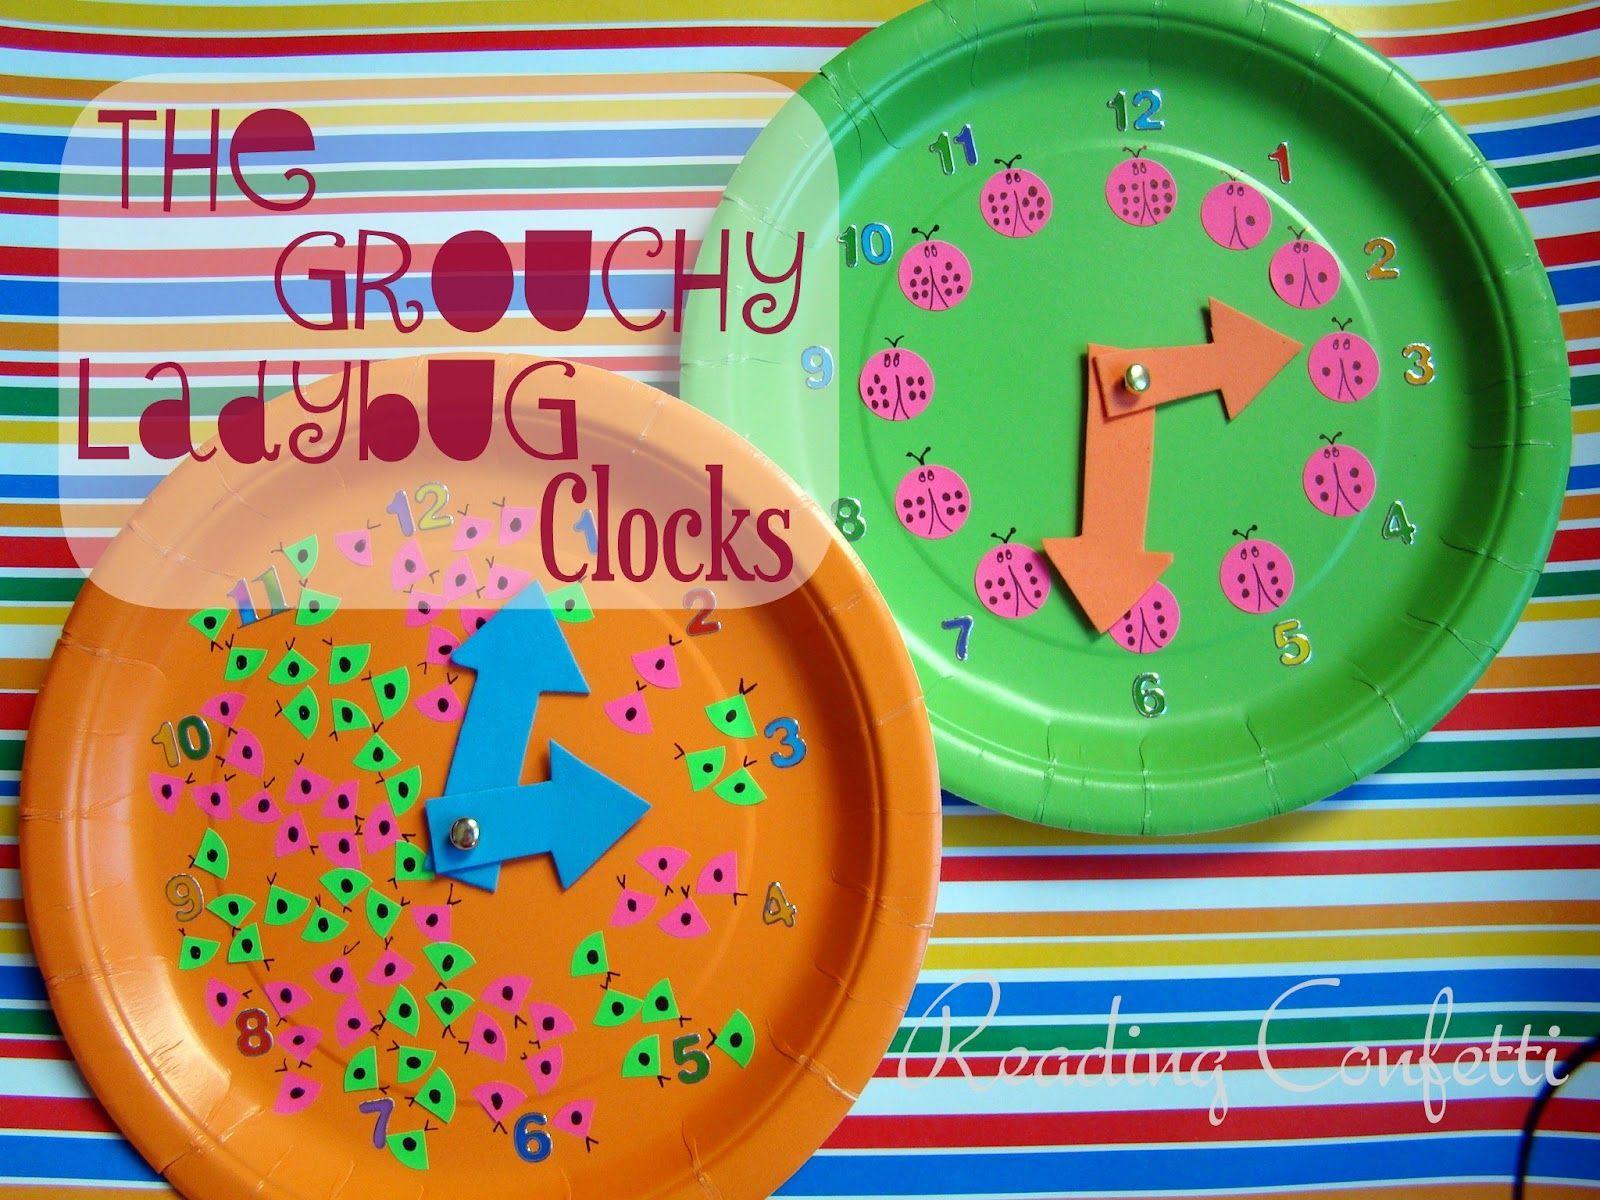 Grouchy Ladybug Clocks & Eric Carle Link Party ~ Reading Confetti